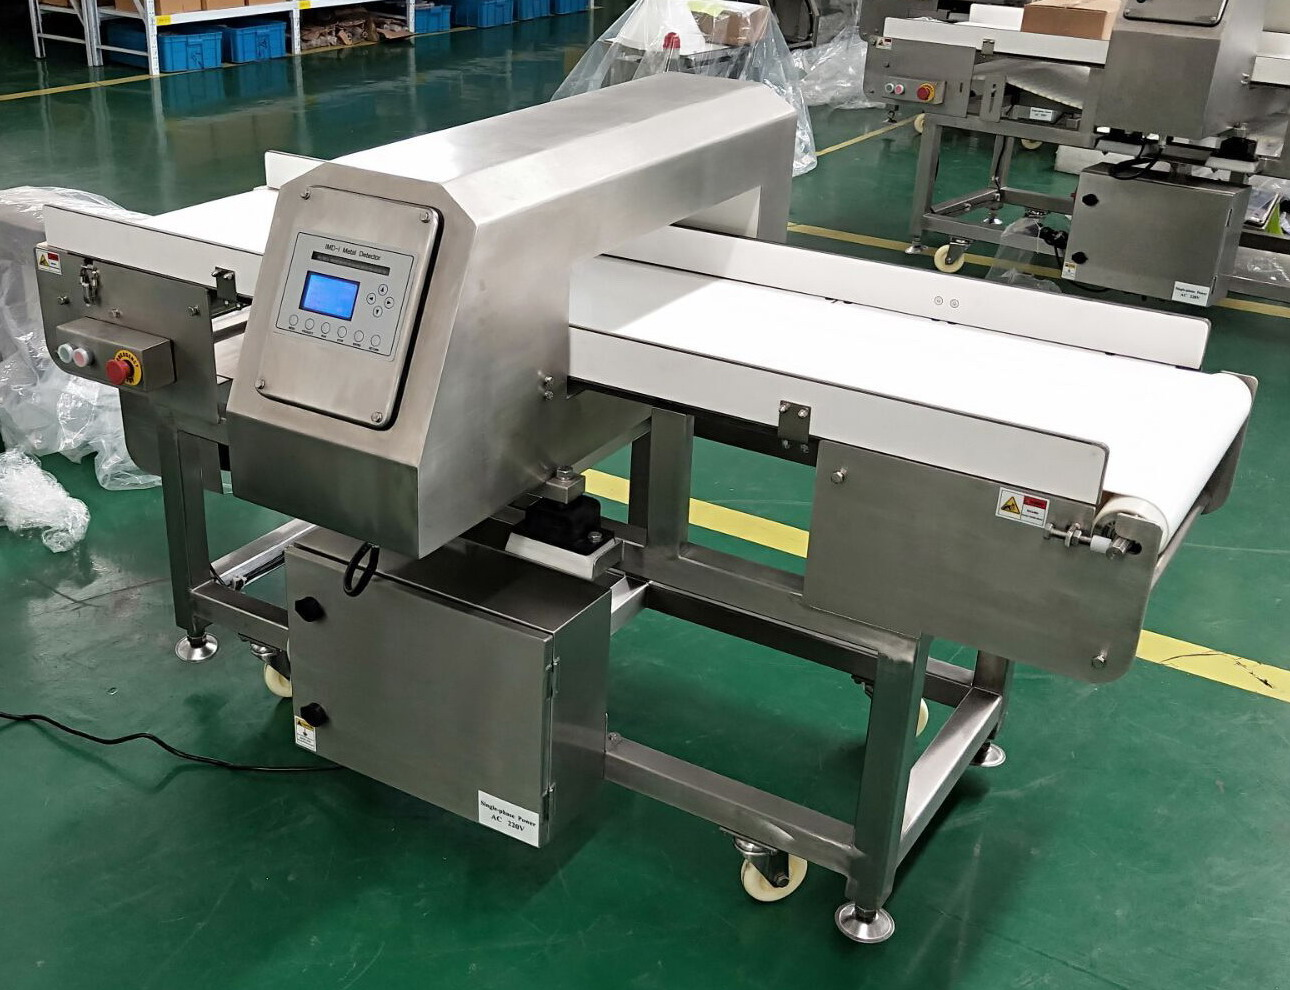 High sensitivity Industrial Metal Detector for Food Seafood Meat Vegetable Fruit Inspection